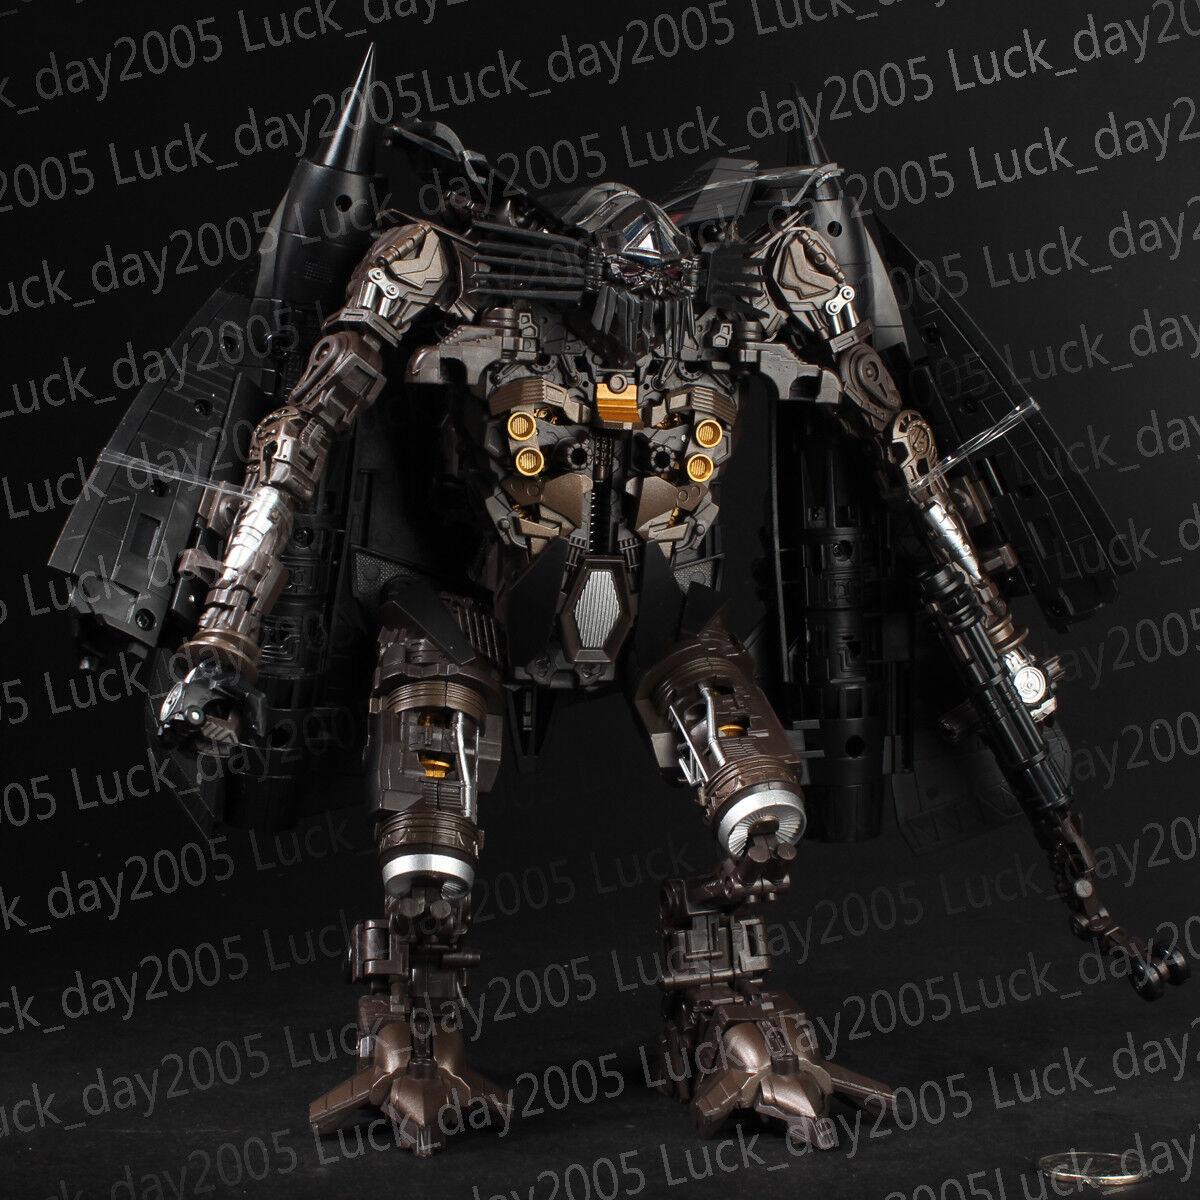 Transformers 2 película Roft Jetfire Leader Class Figura